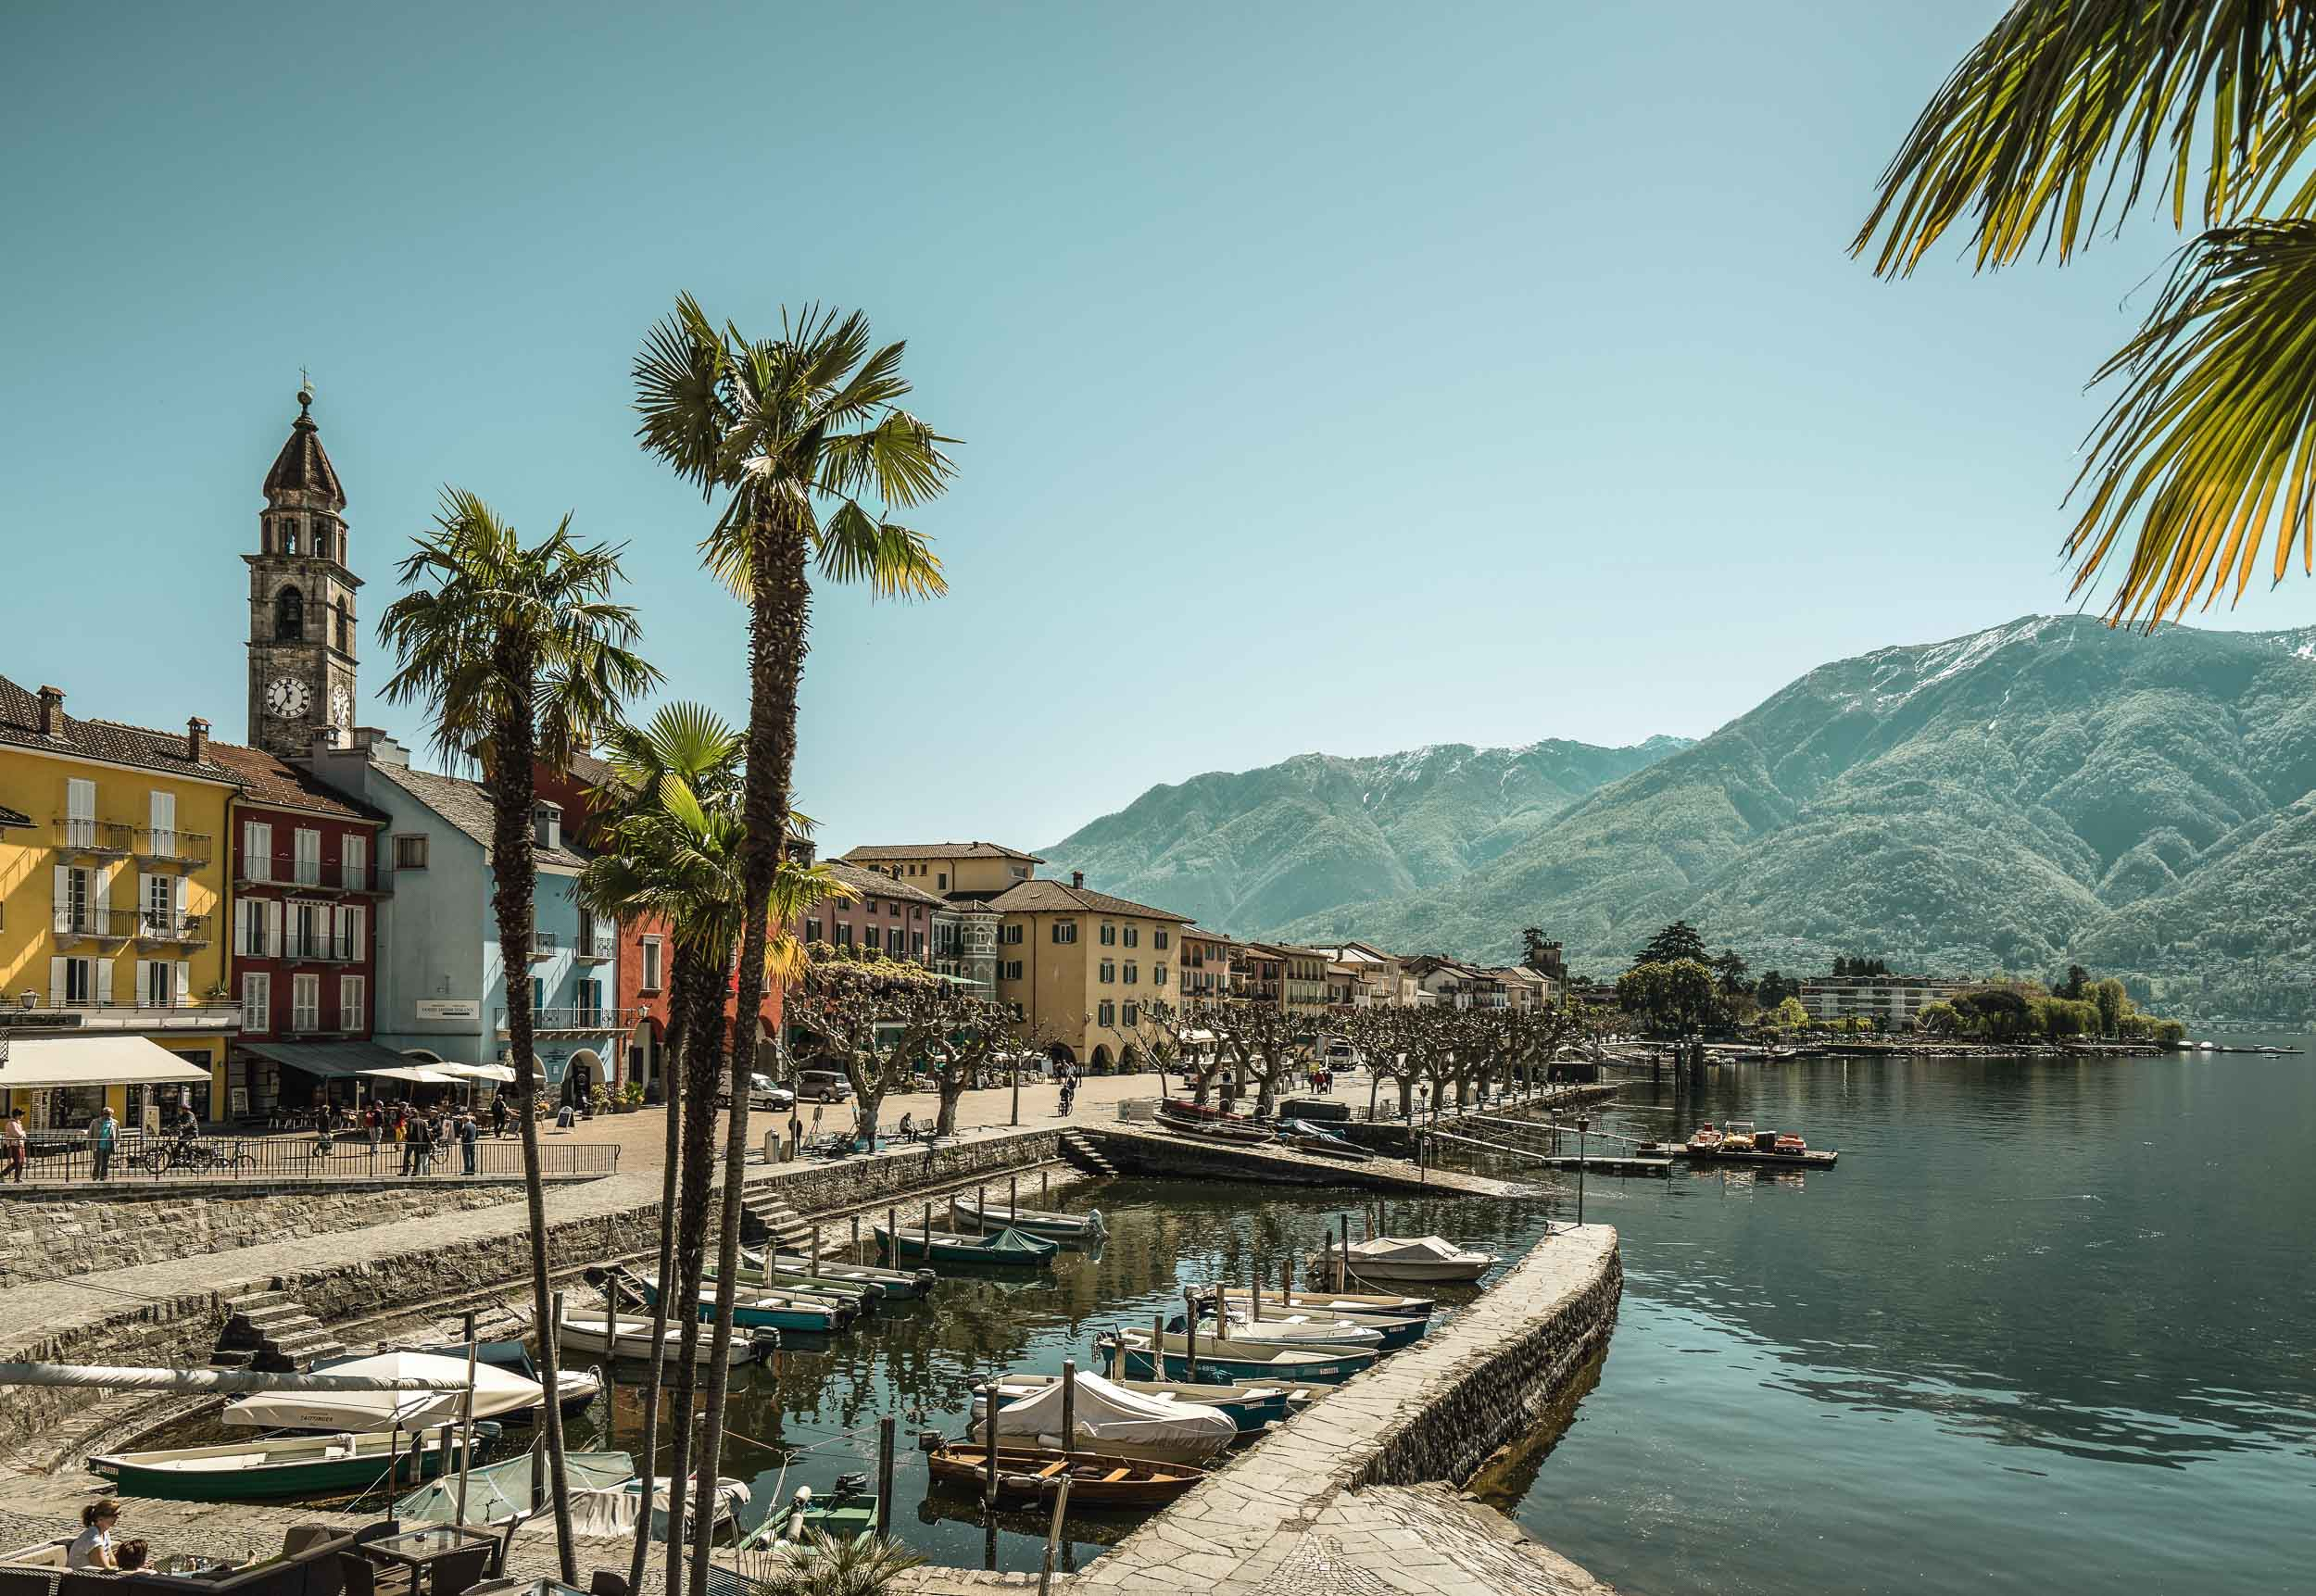 Spring on the lakeside promenade, Ascona. Copyright by: Switzerland Tourism